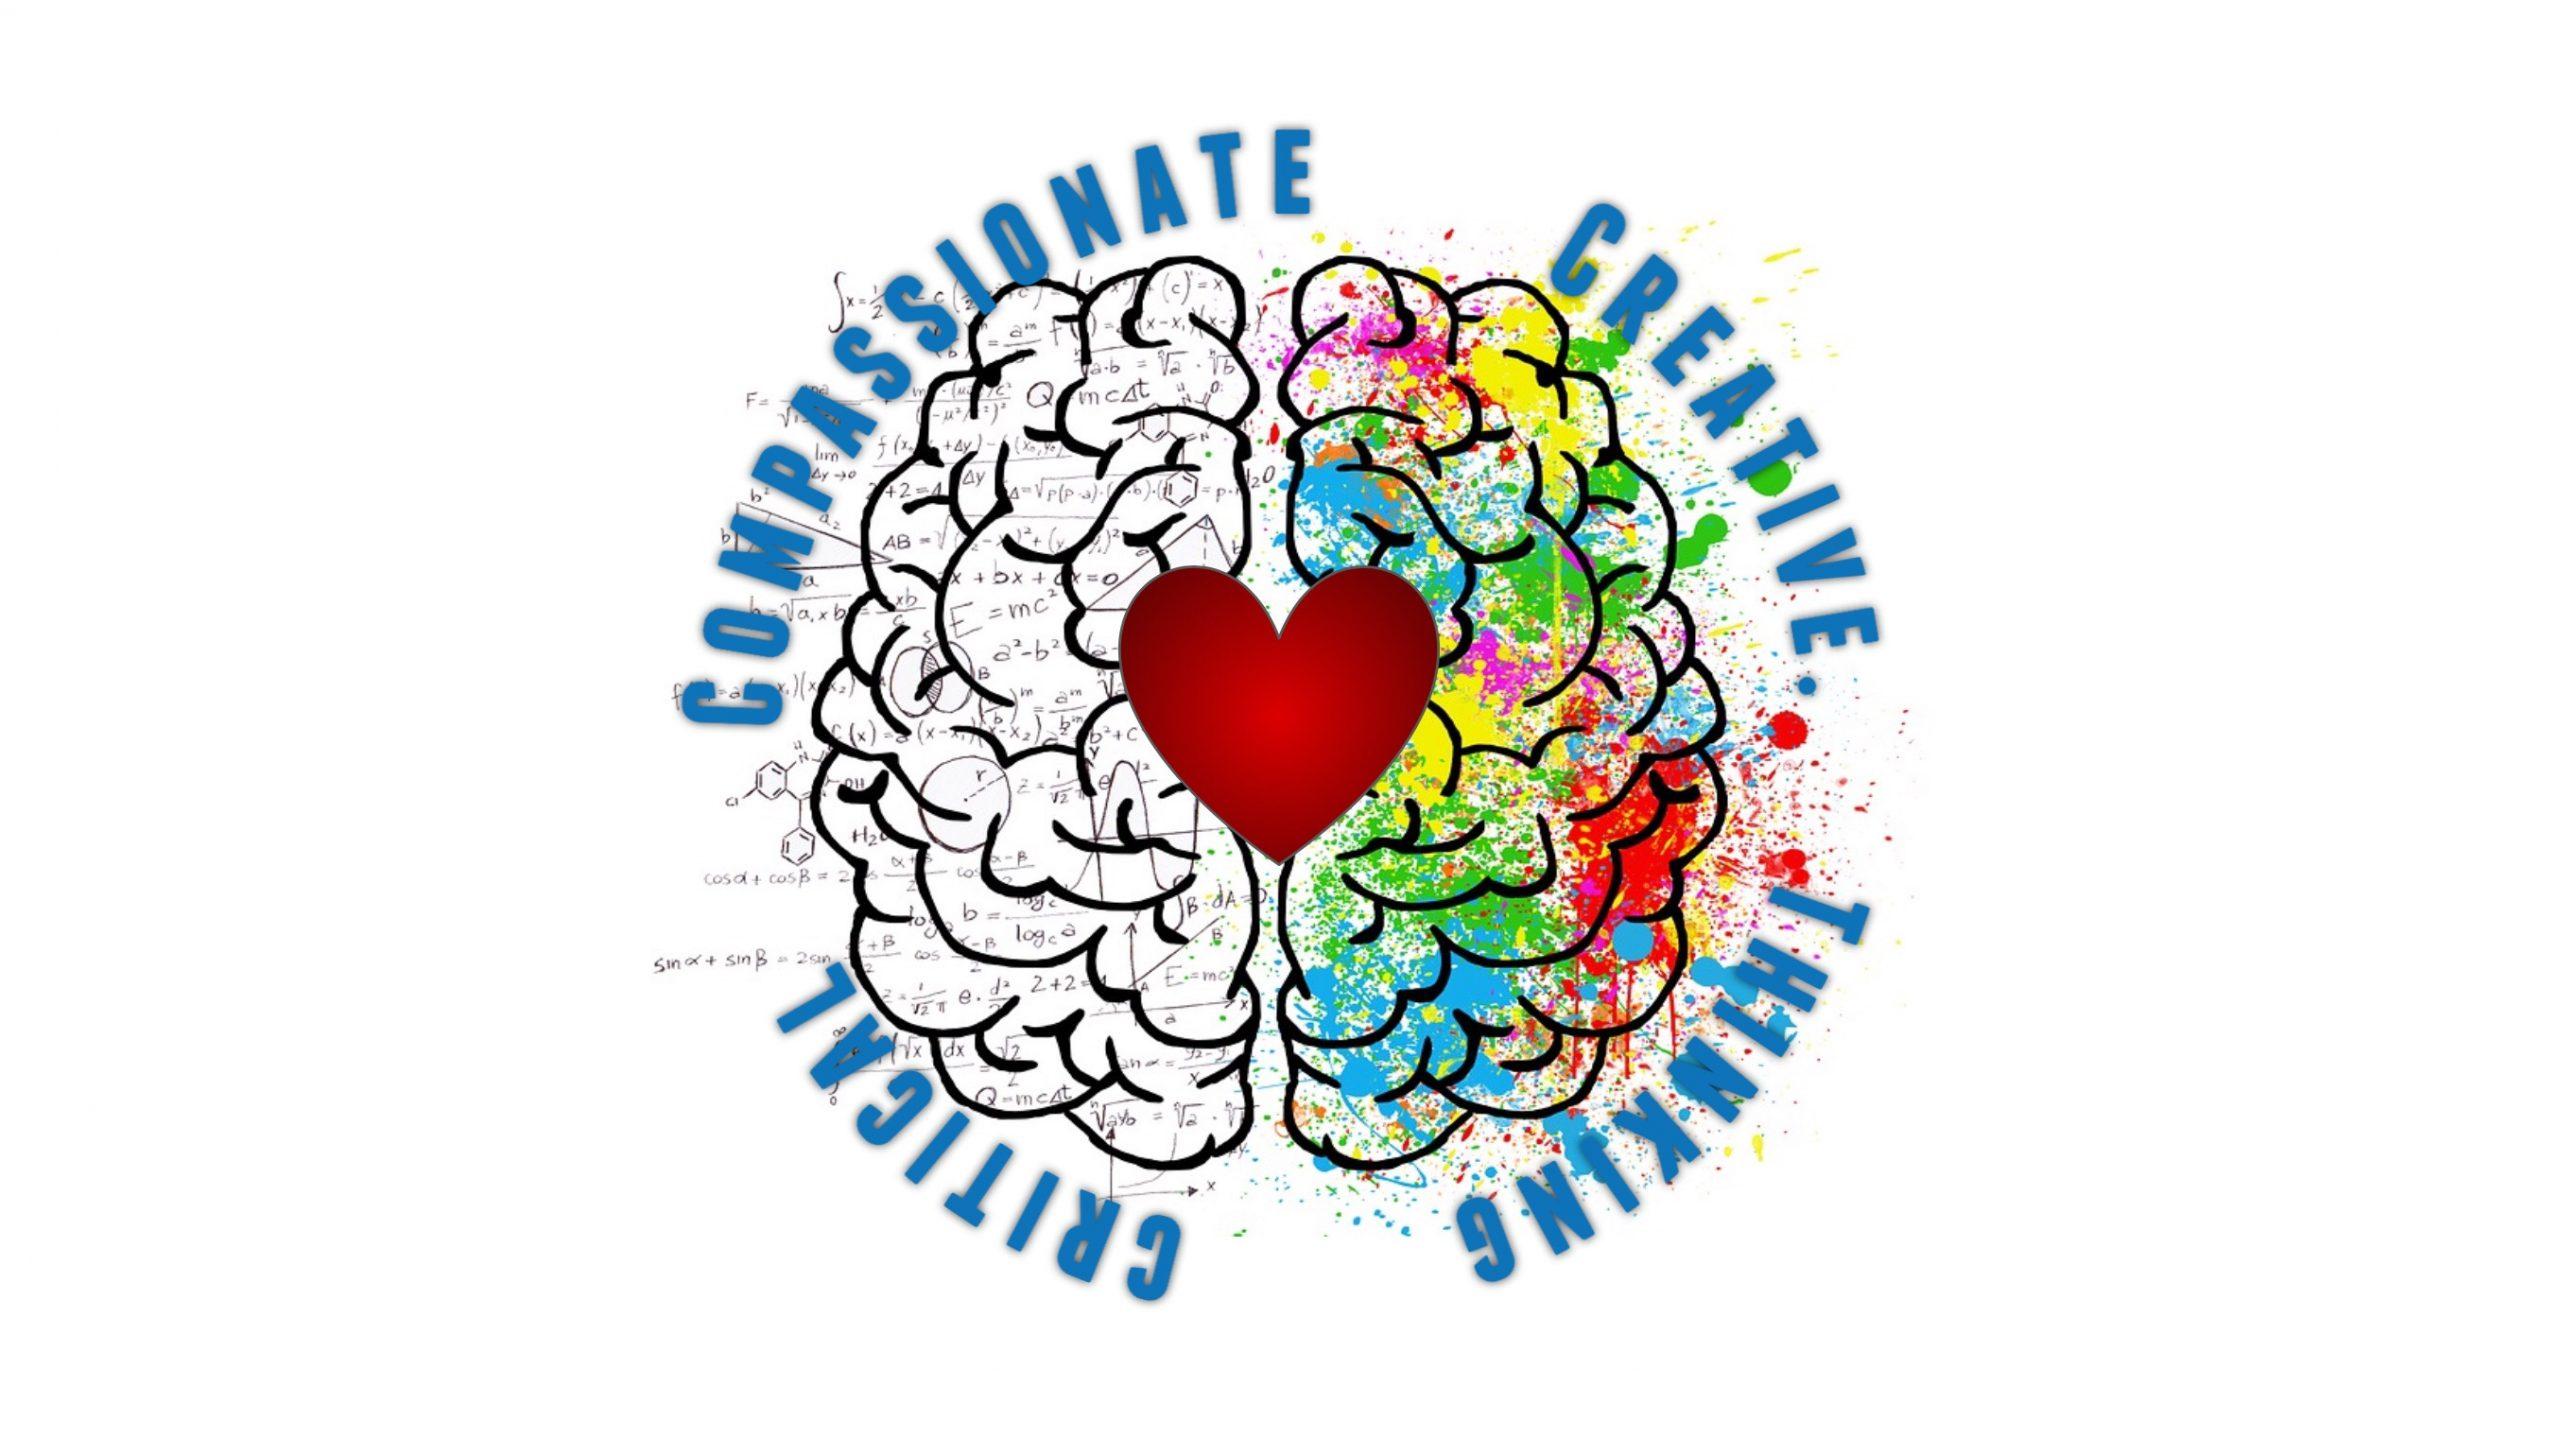 Critical Creative Compassionate Thinking